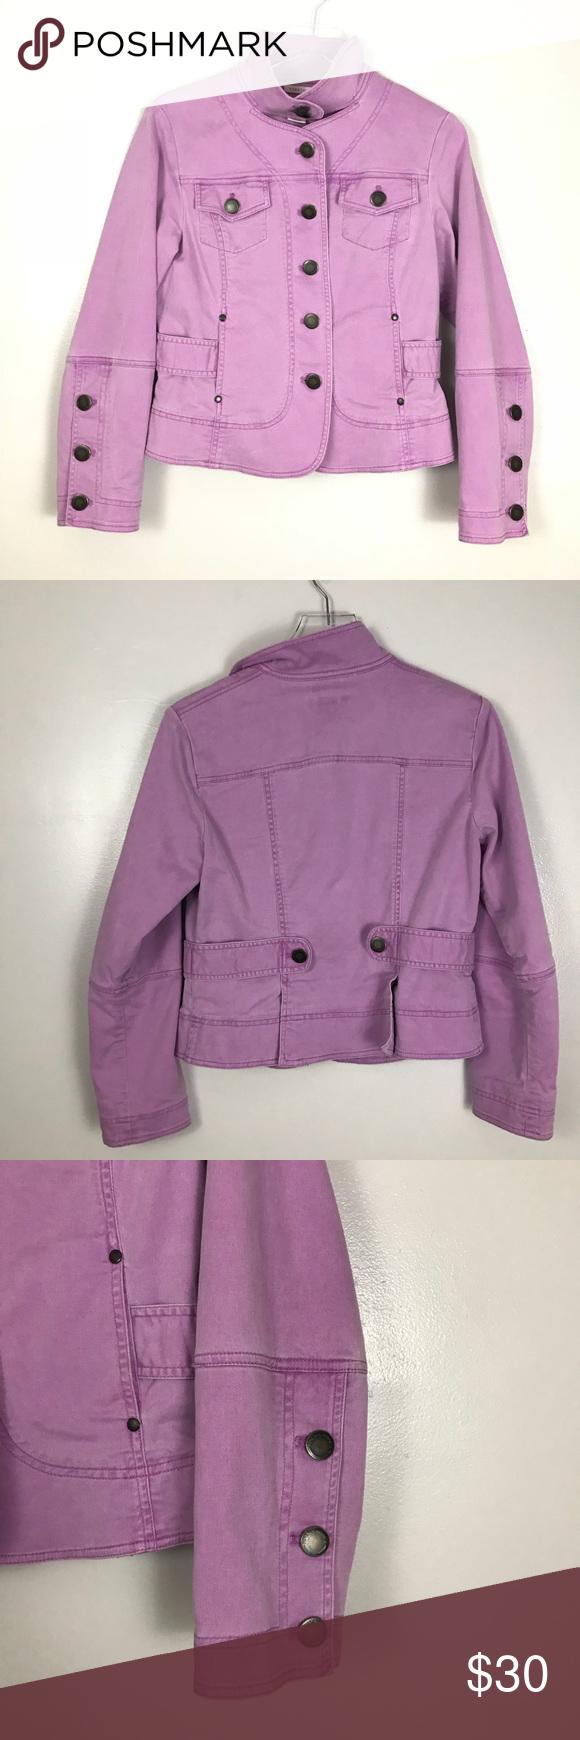 3 30 Lavender Twill Moto Jean Jacket Moto Jeans Clothes Design Jean Jacket [ 1740 x 580 Pixel ]